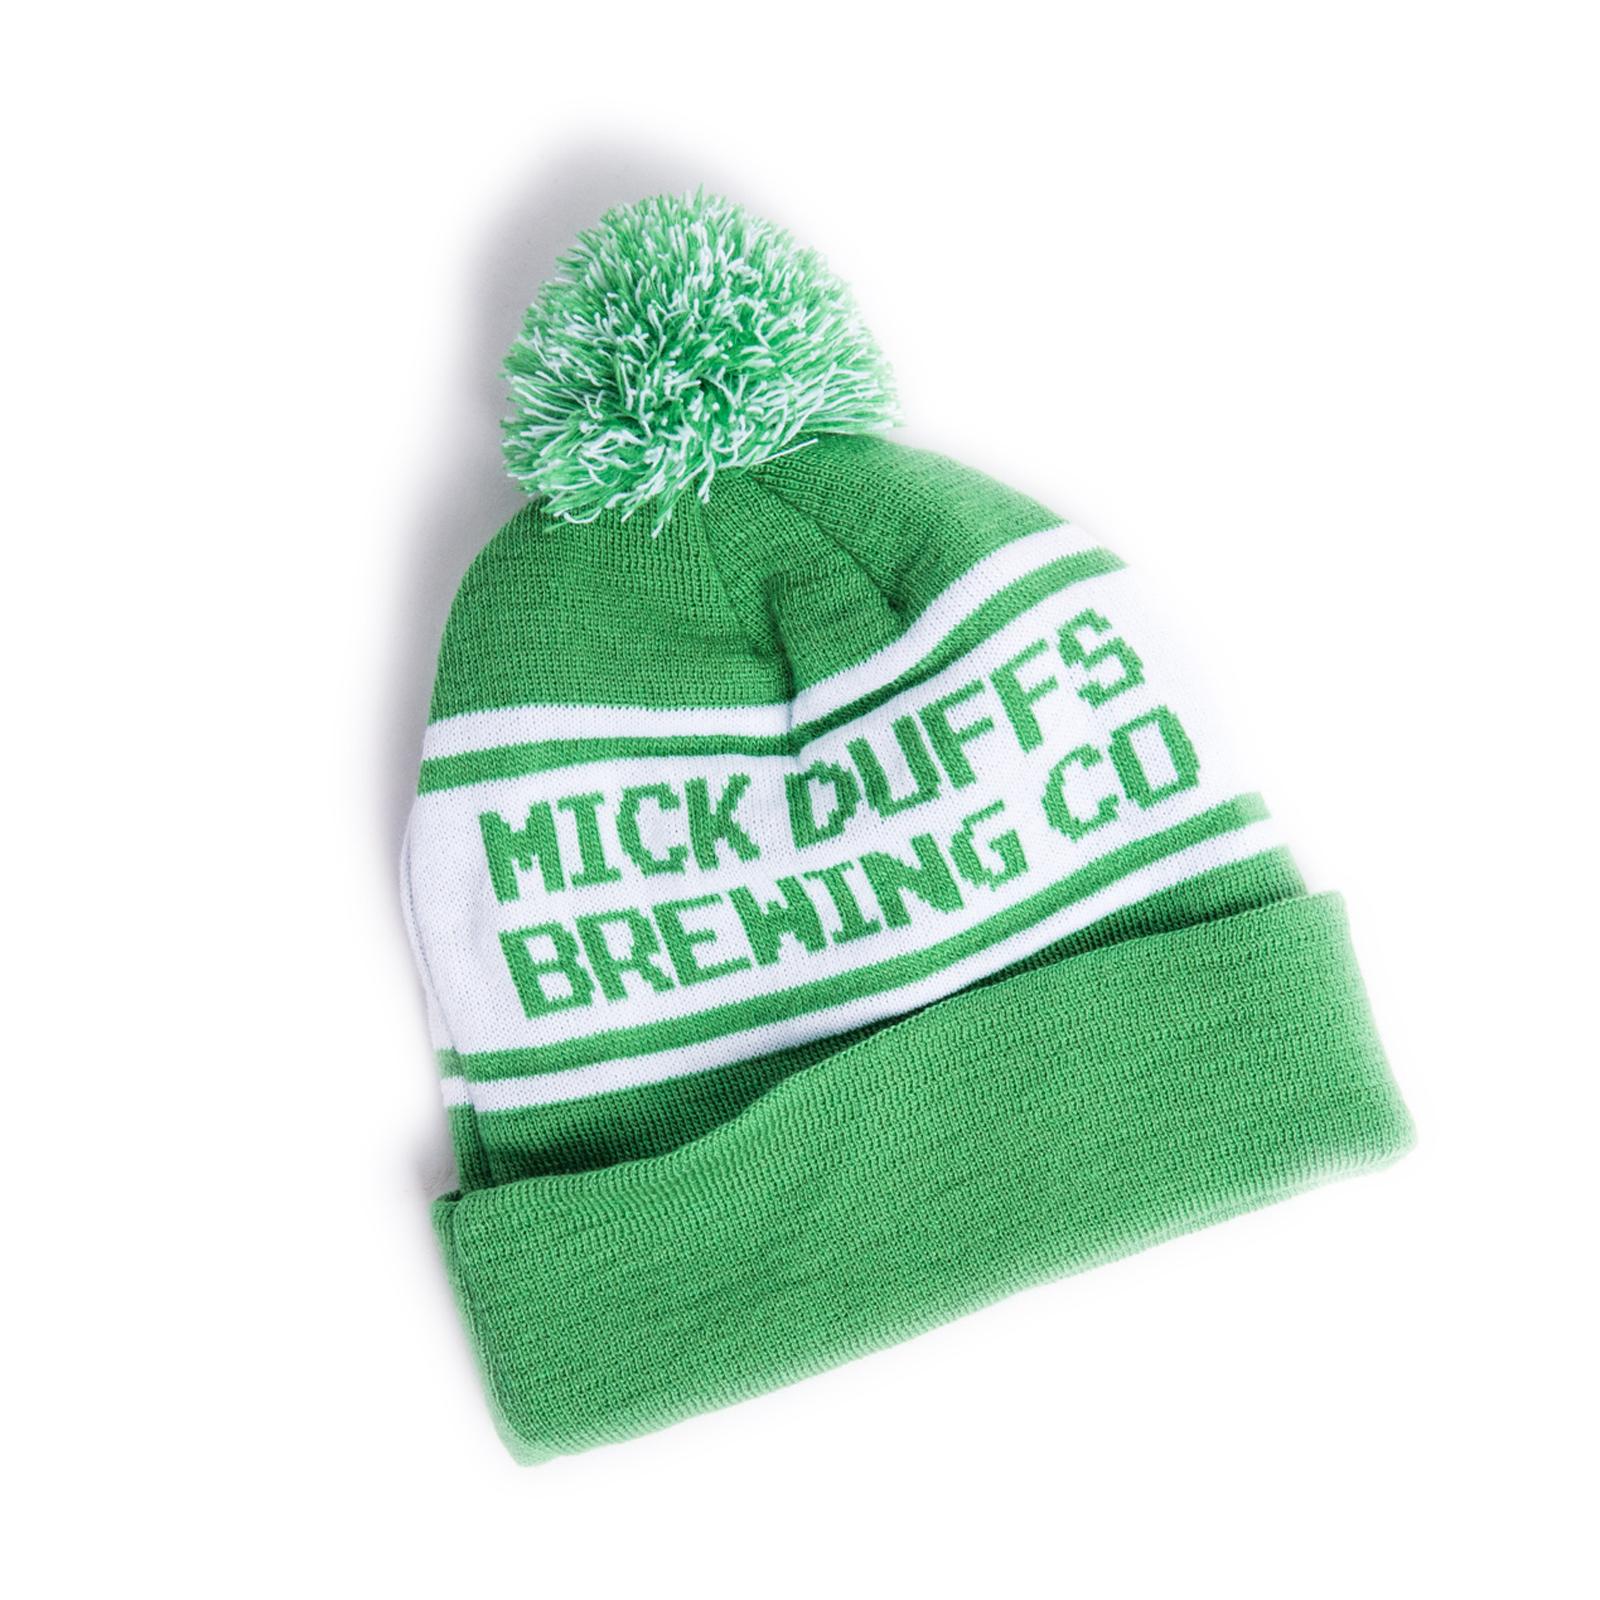 2016-01-12_2018-02-19_MickduffsRetail-50-LoRes-copy.jpg